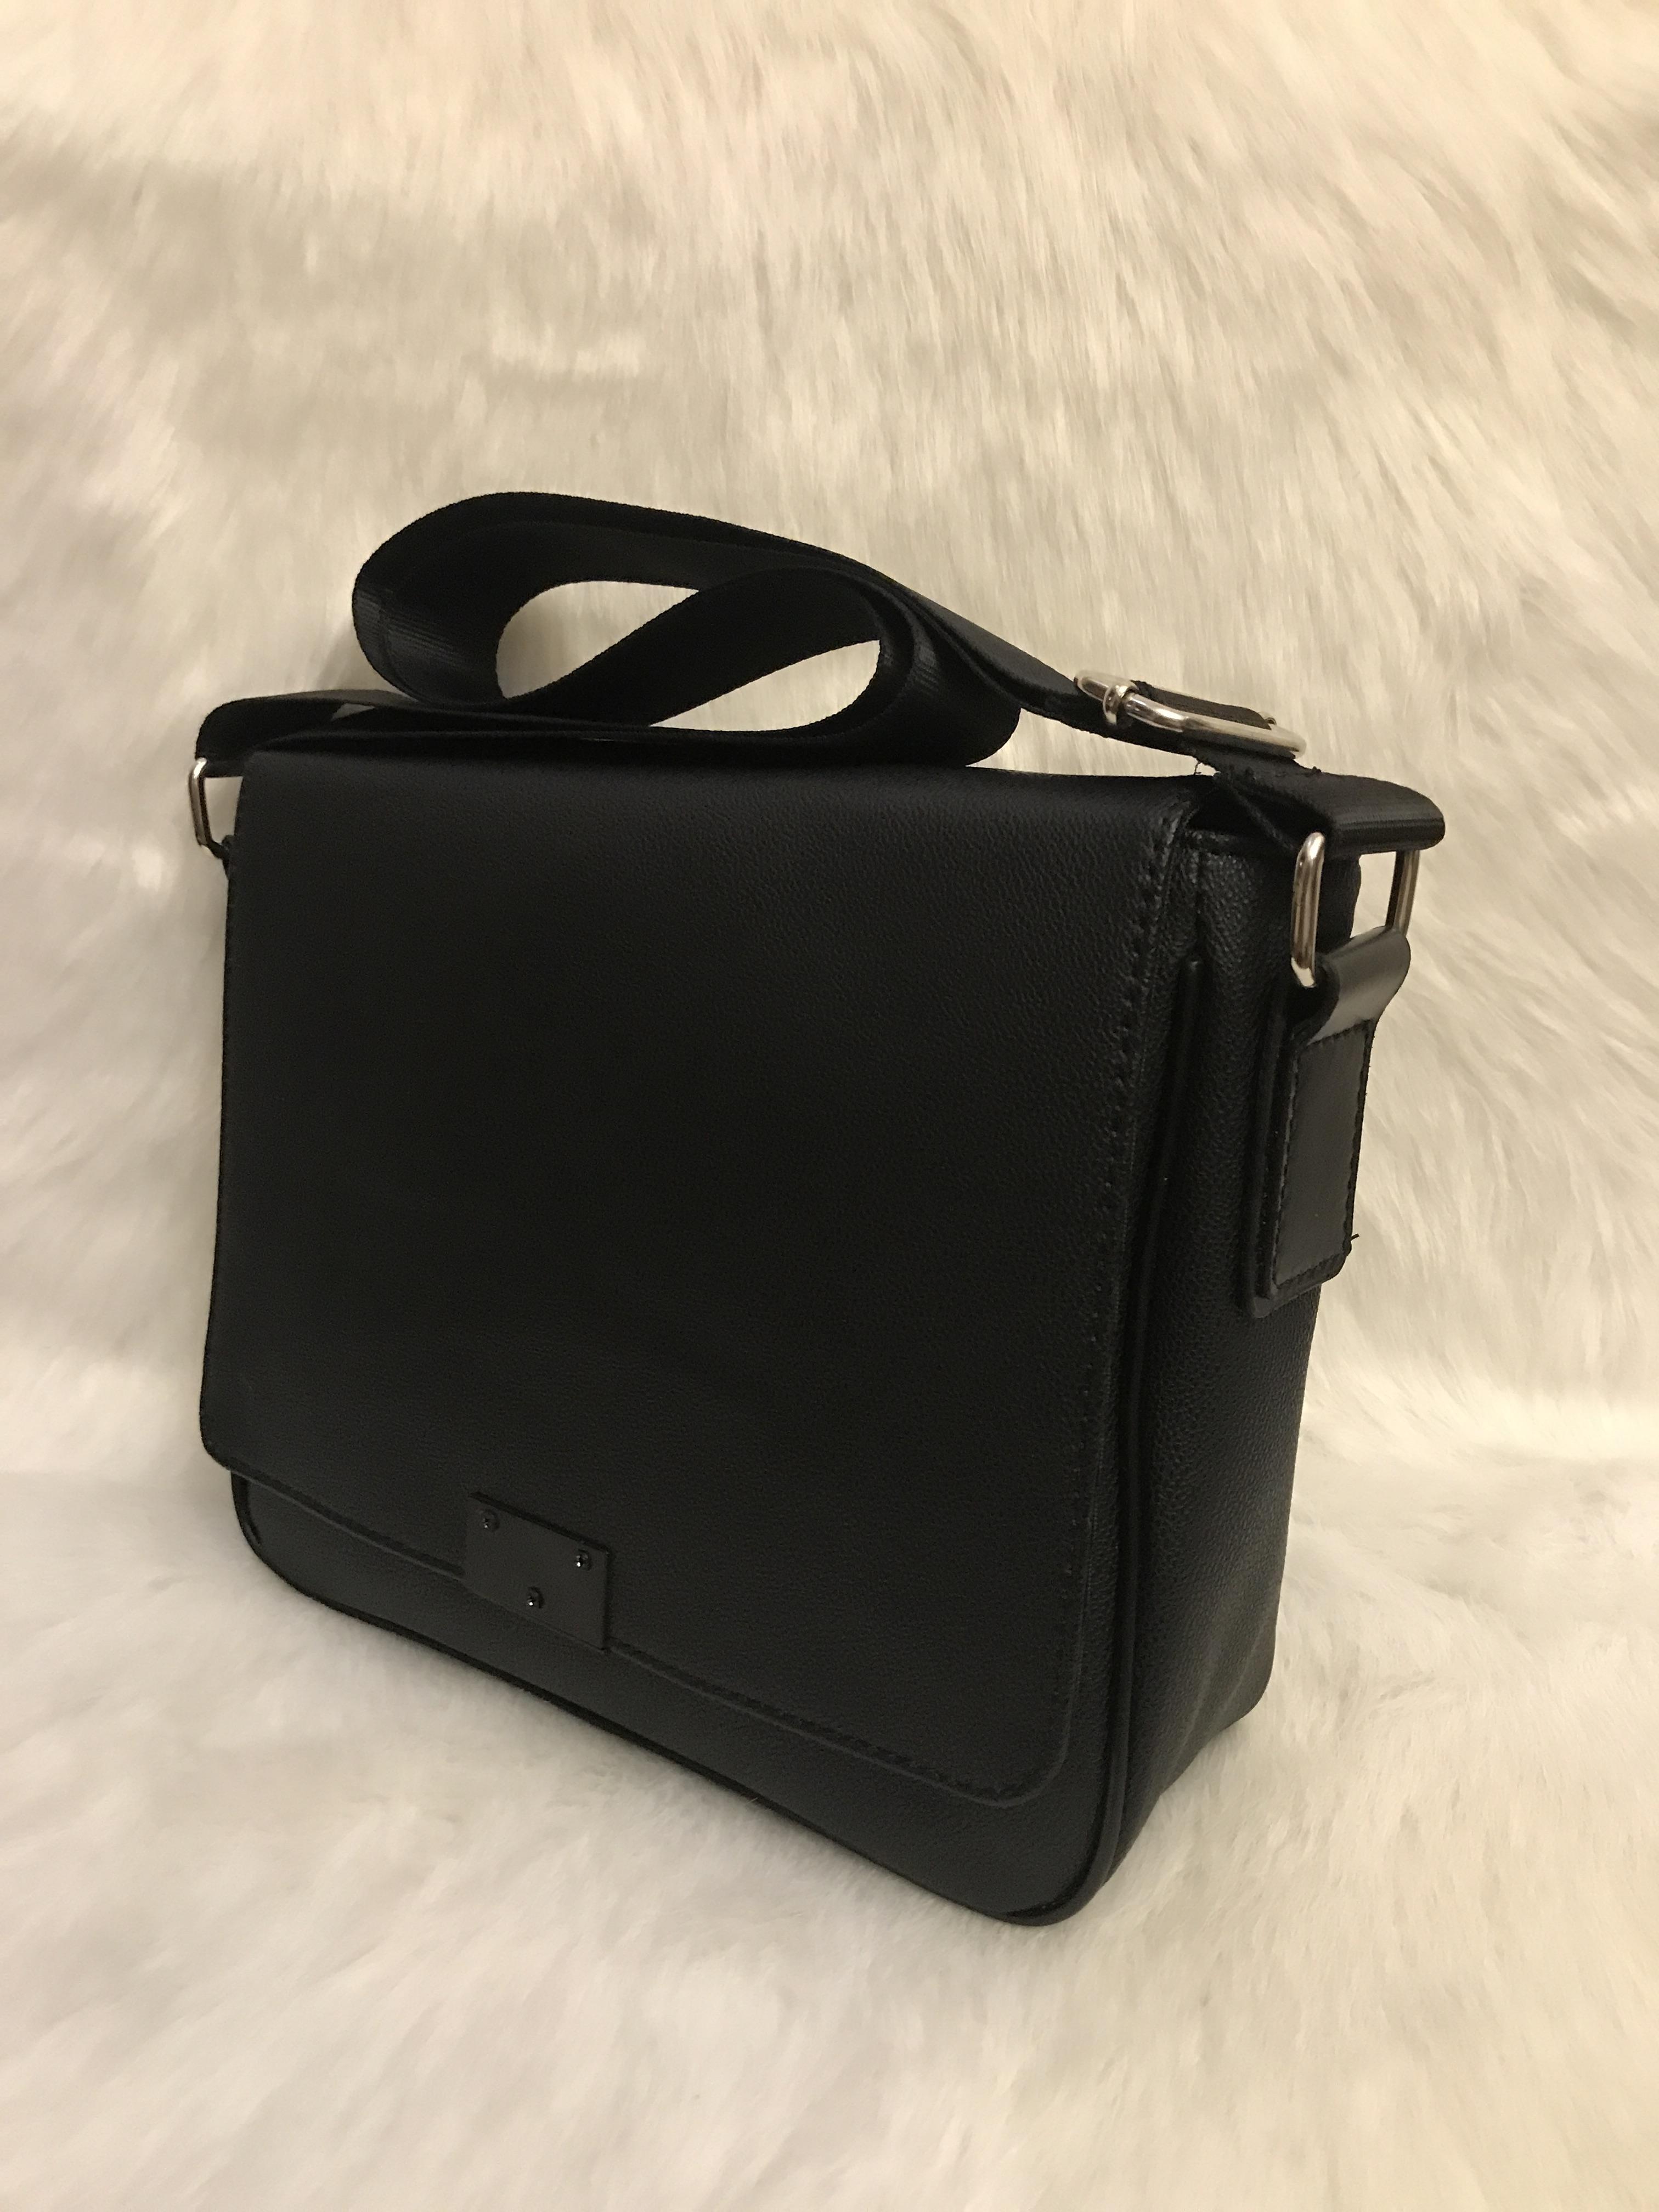 Borse da uomo Borsa da uomo Business Casual Messenger Spalla Designer Briefcase Uomini Crossbody AA01 Vintage XitGD